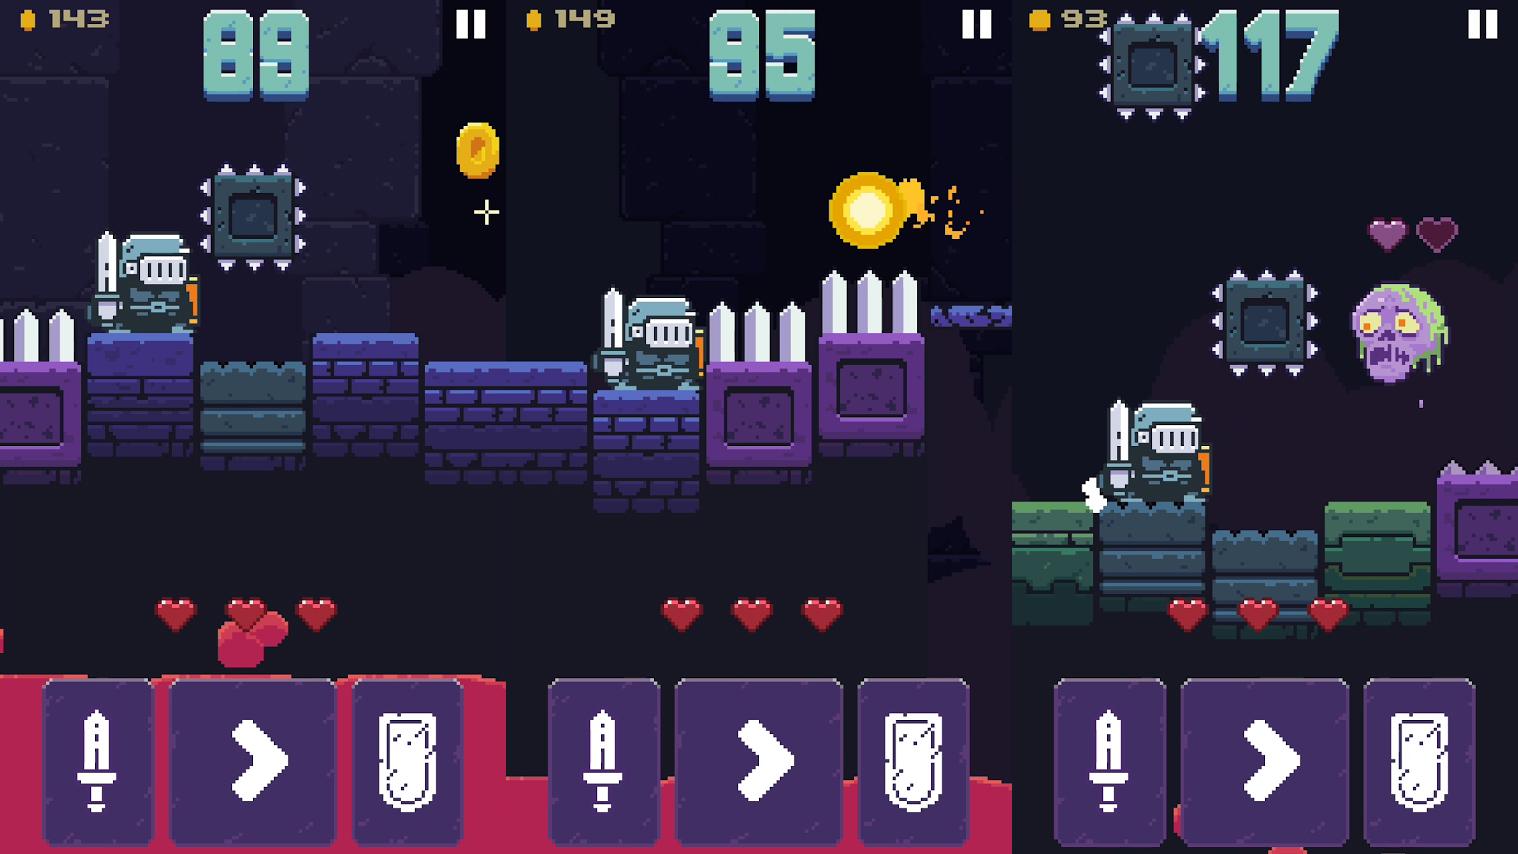 pBugtJqc9F9qG99GUJkGGd - The best free Android games 2018